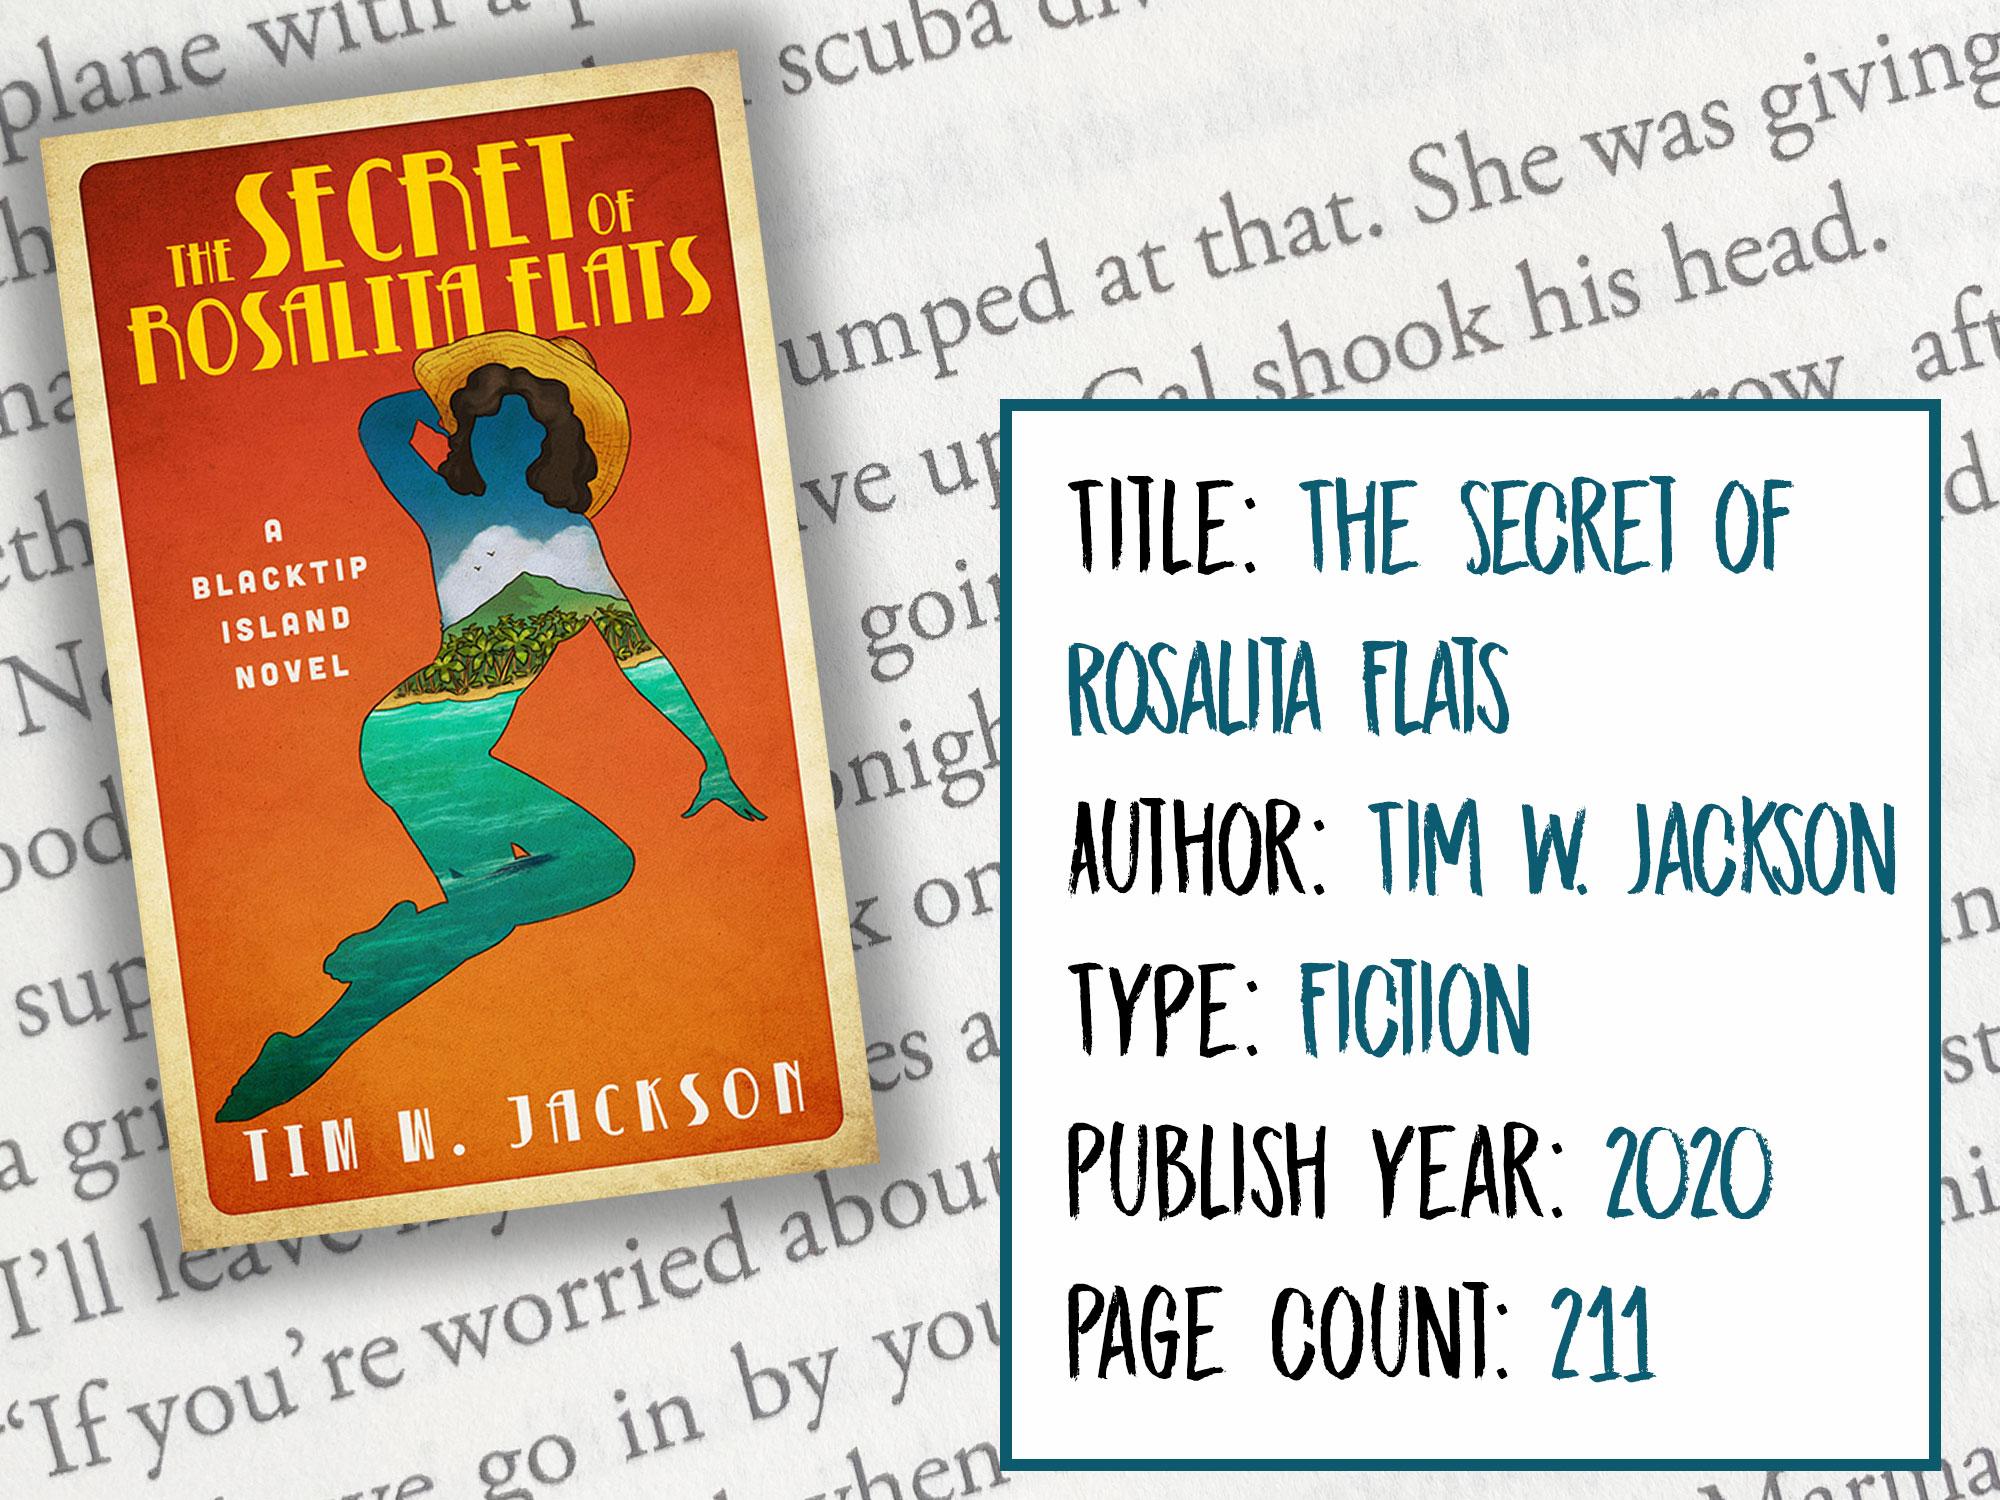 The Secret Of Rosalita Flats Reviewed Book Information